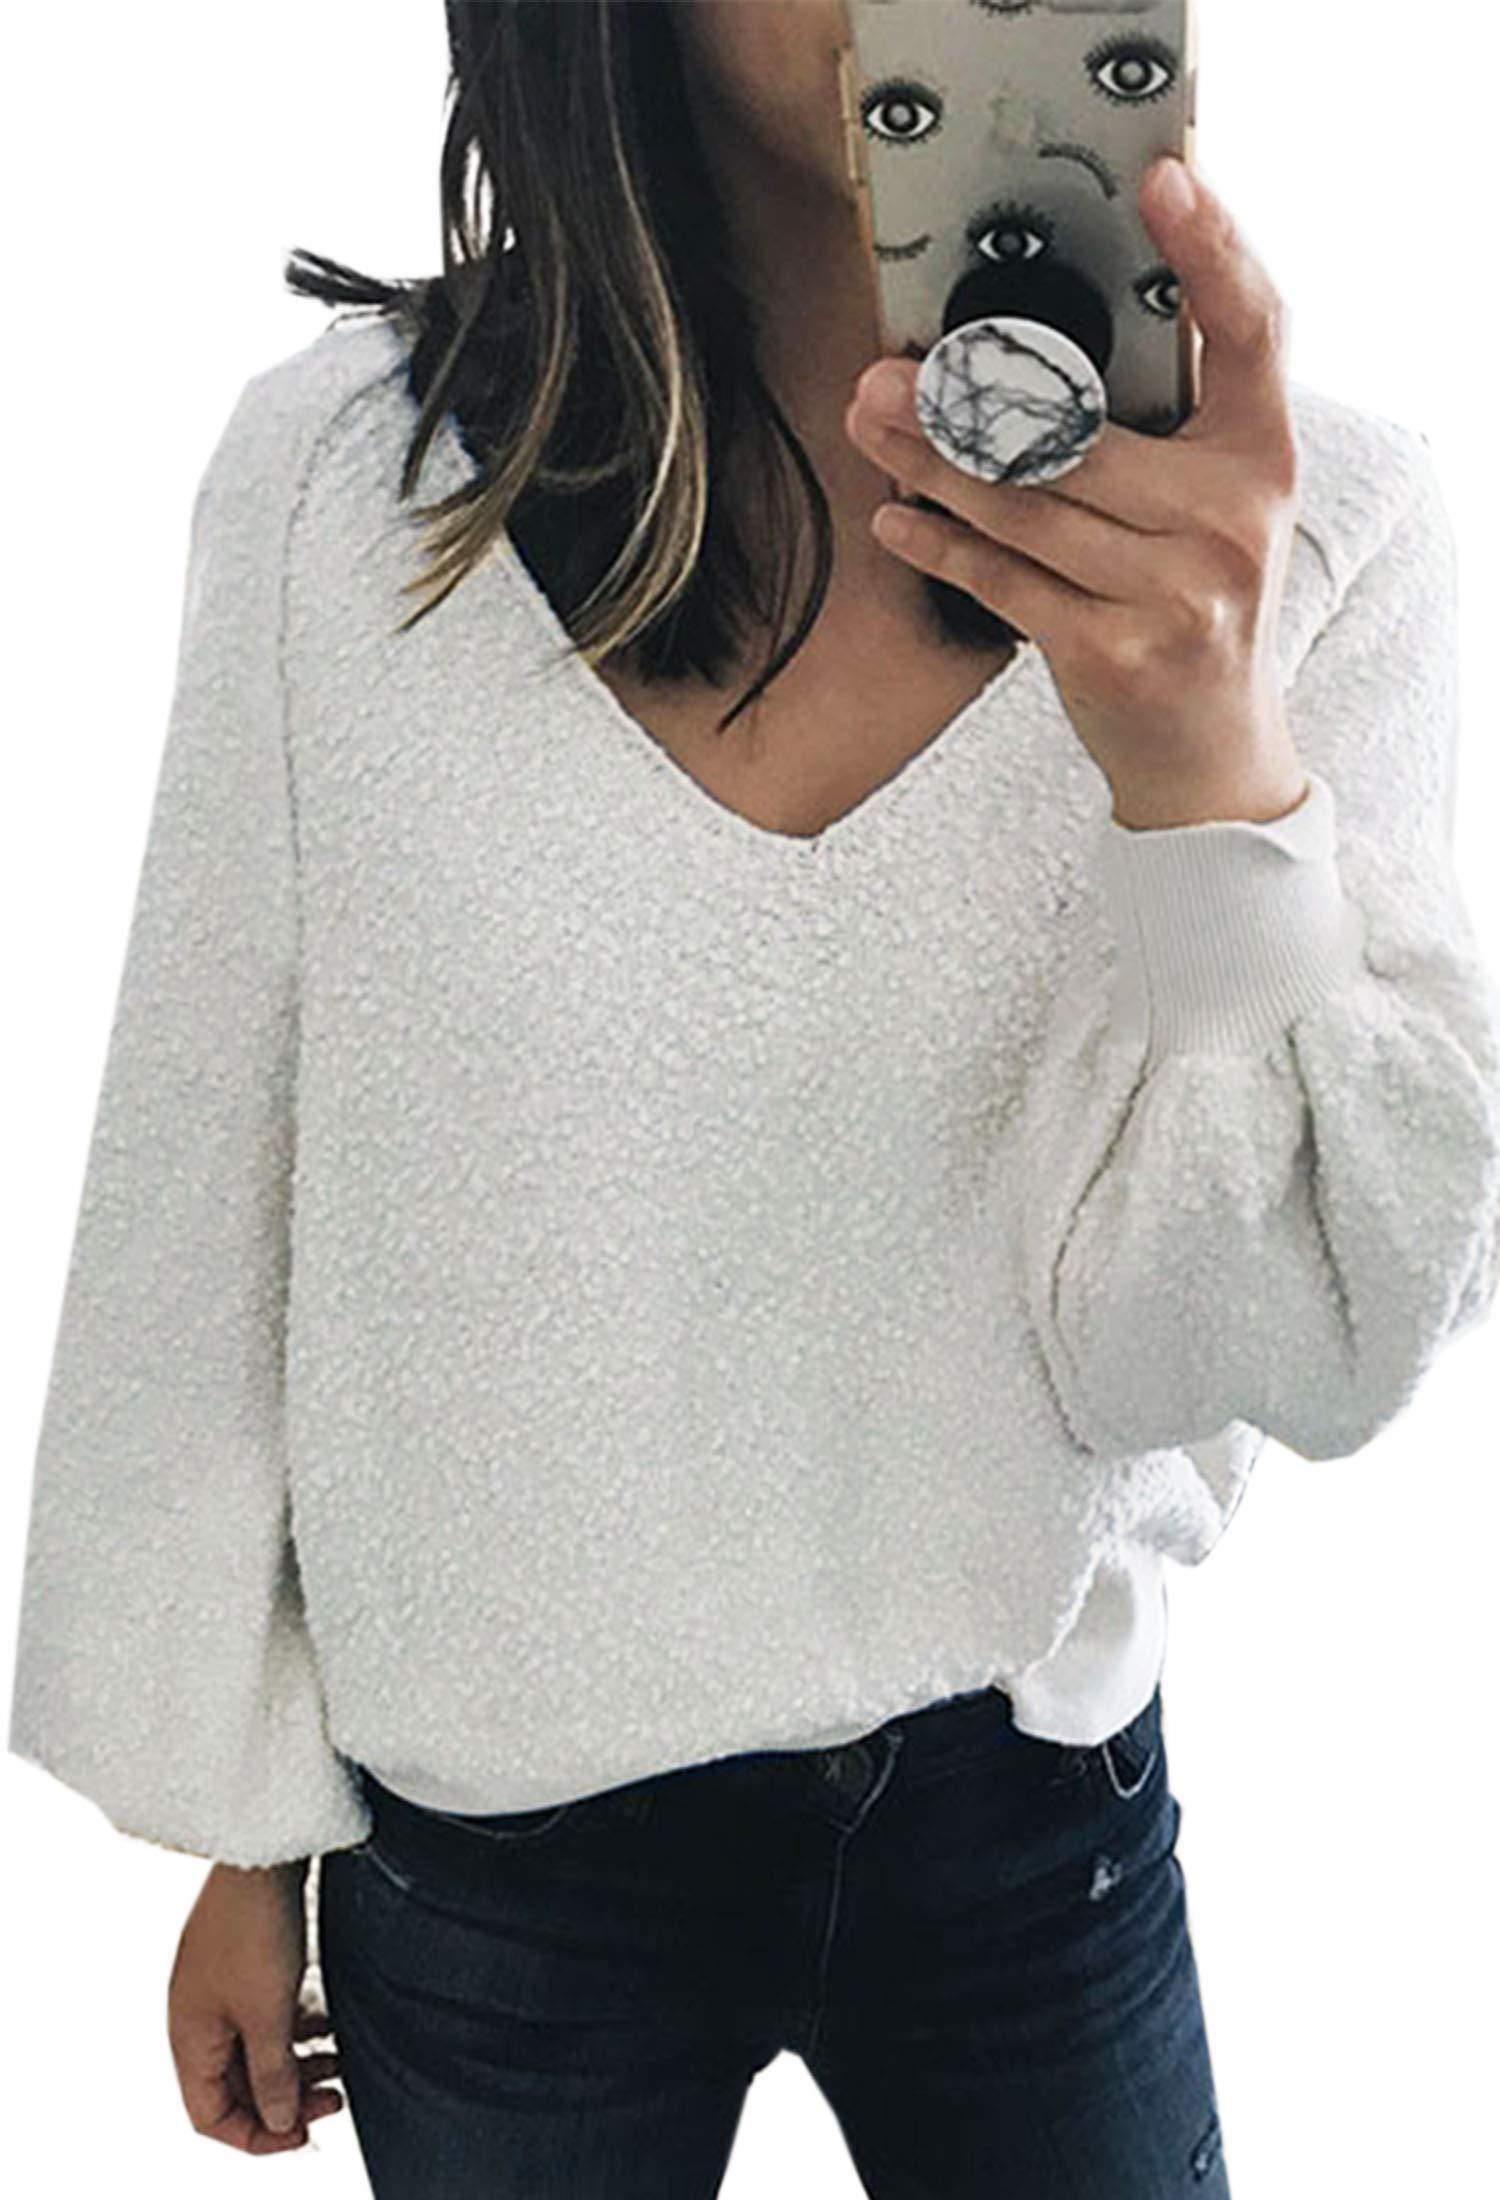 Angashion Women Sweatshirts - Long Sleeve V Neck Fleece Fuzzy Loose Pullover Sweater Tops White M